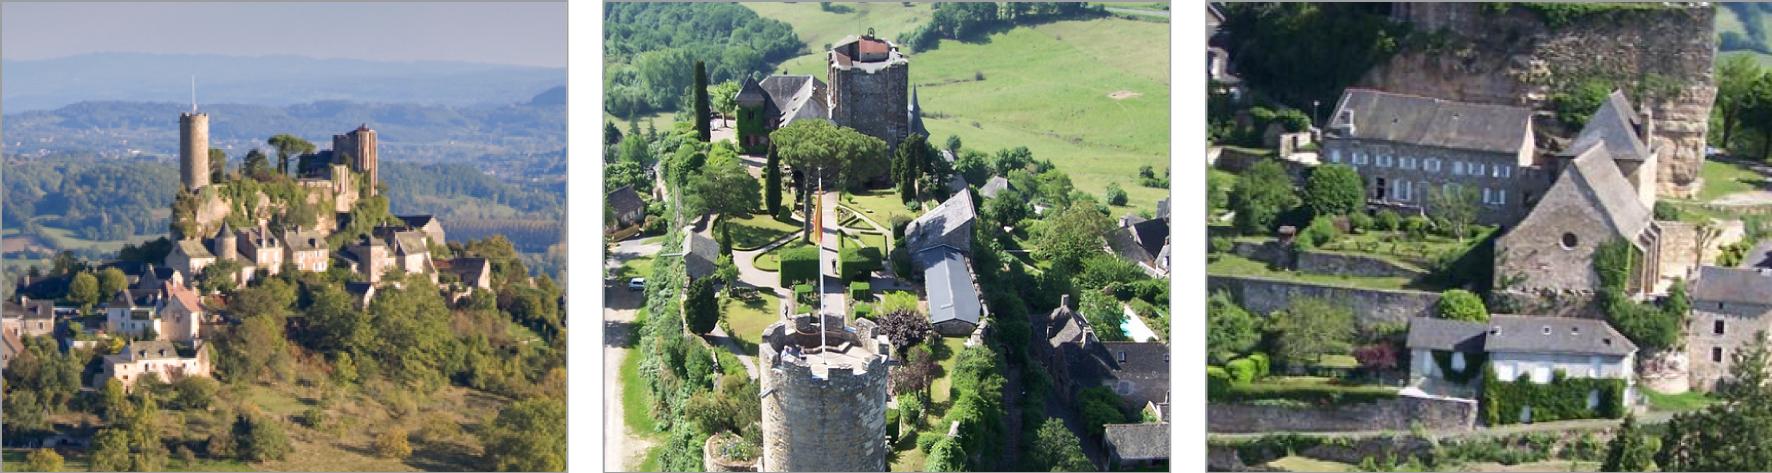 Miel-Tourisme-Turenne